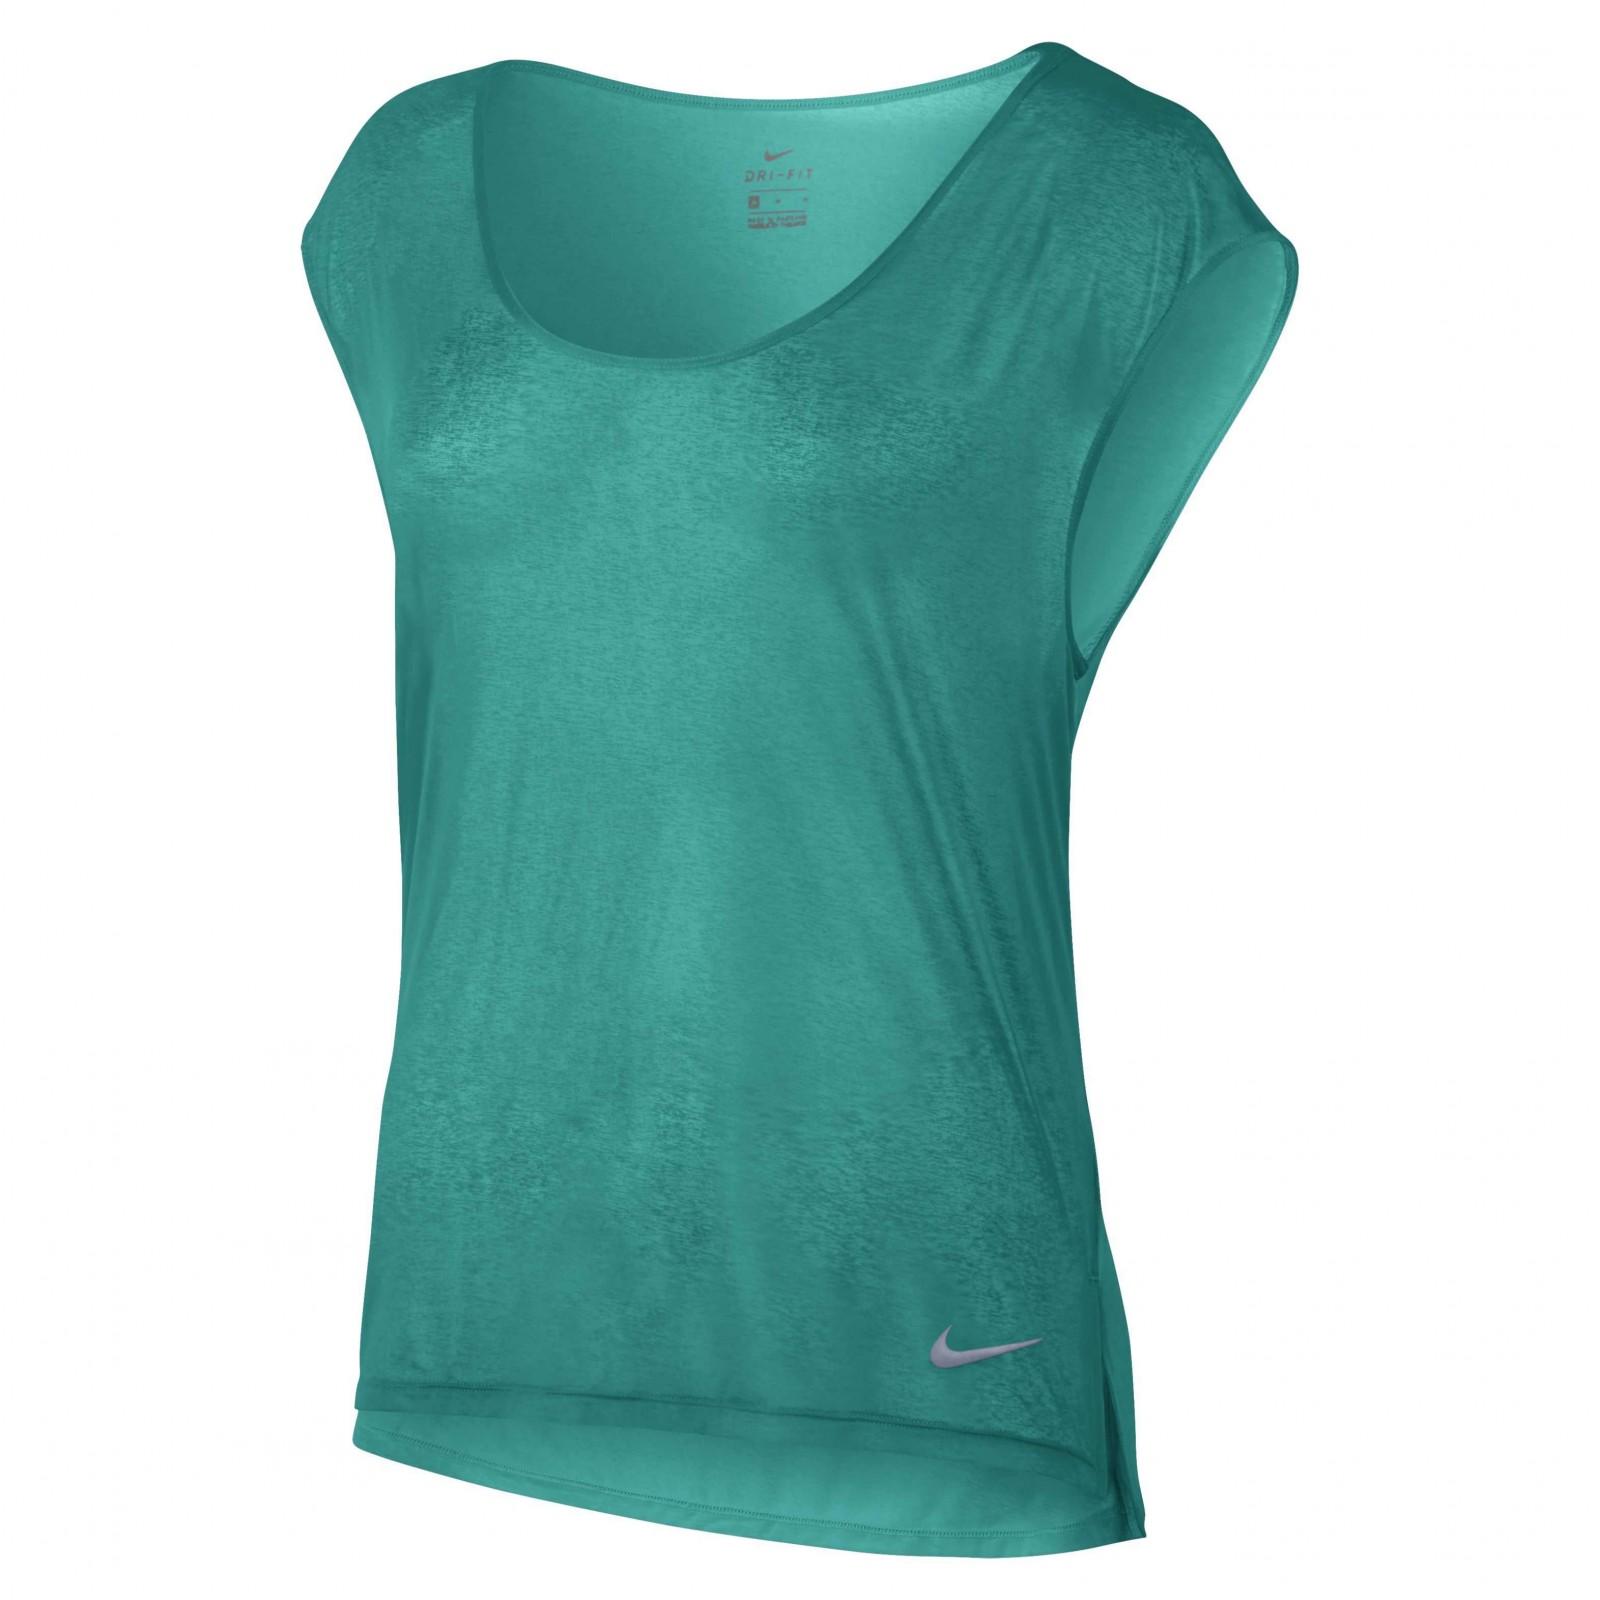 37728ba55164 Dámské tričko Nike W NK BRTHE TOP SS COOL